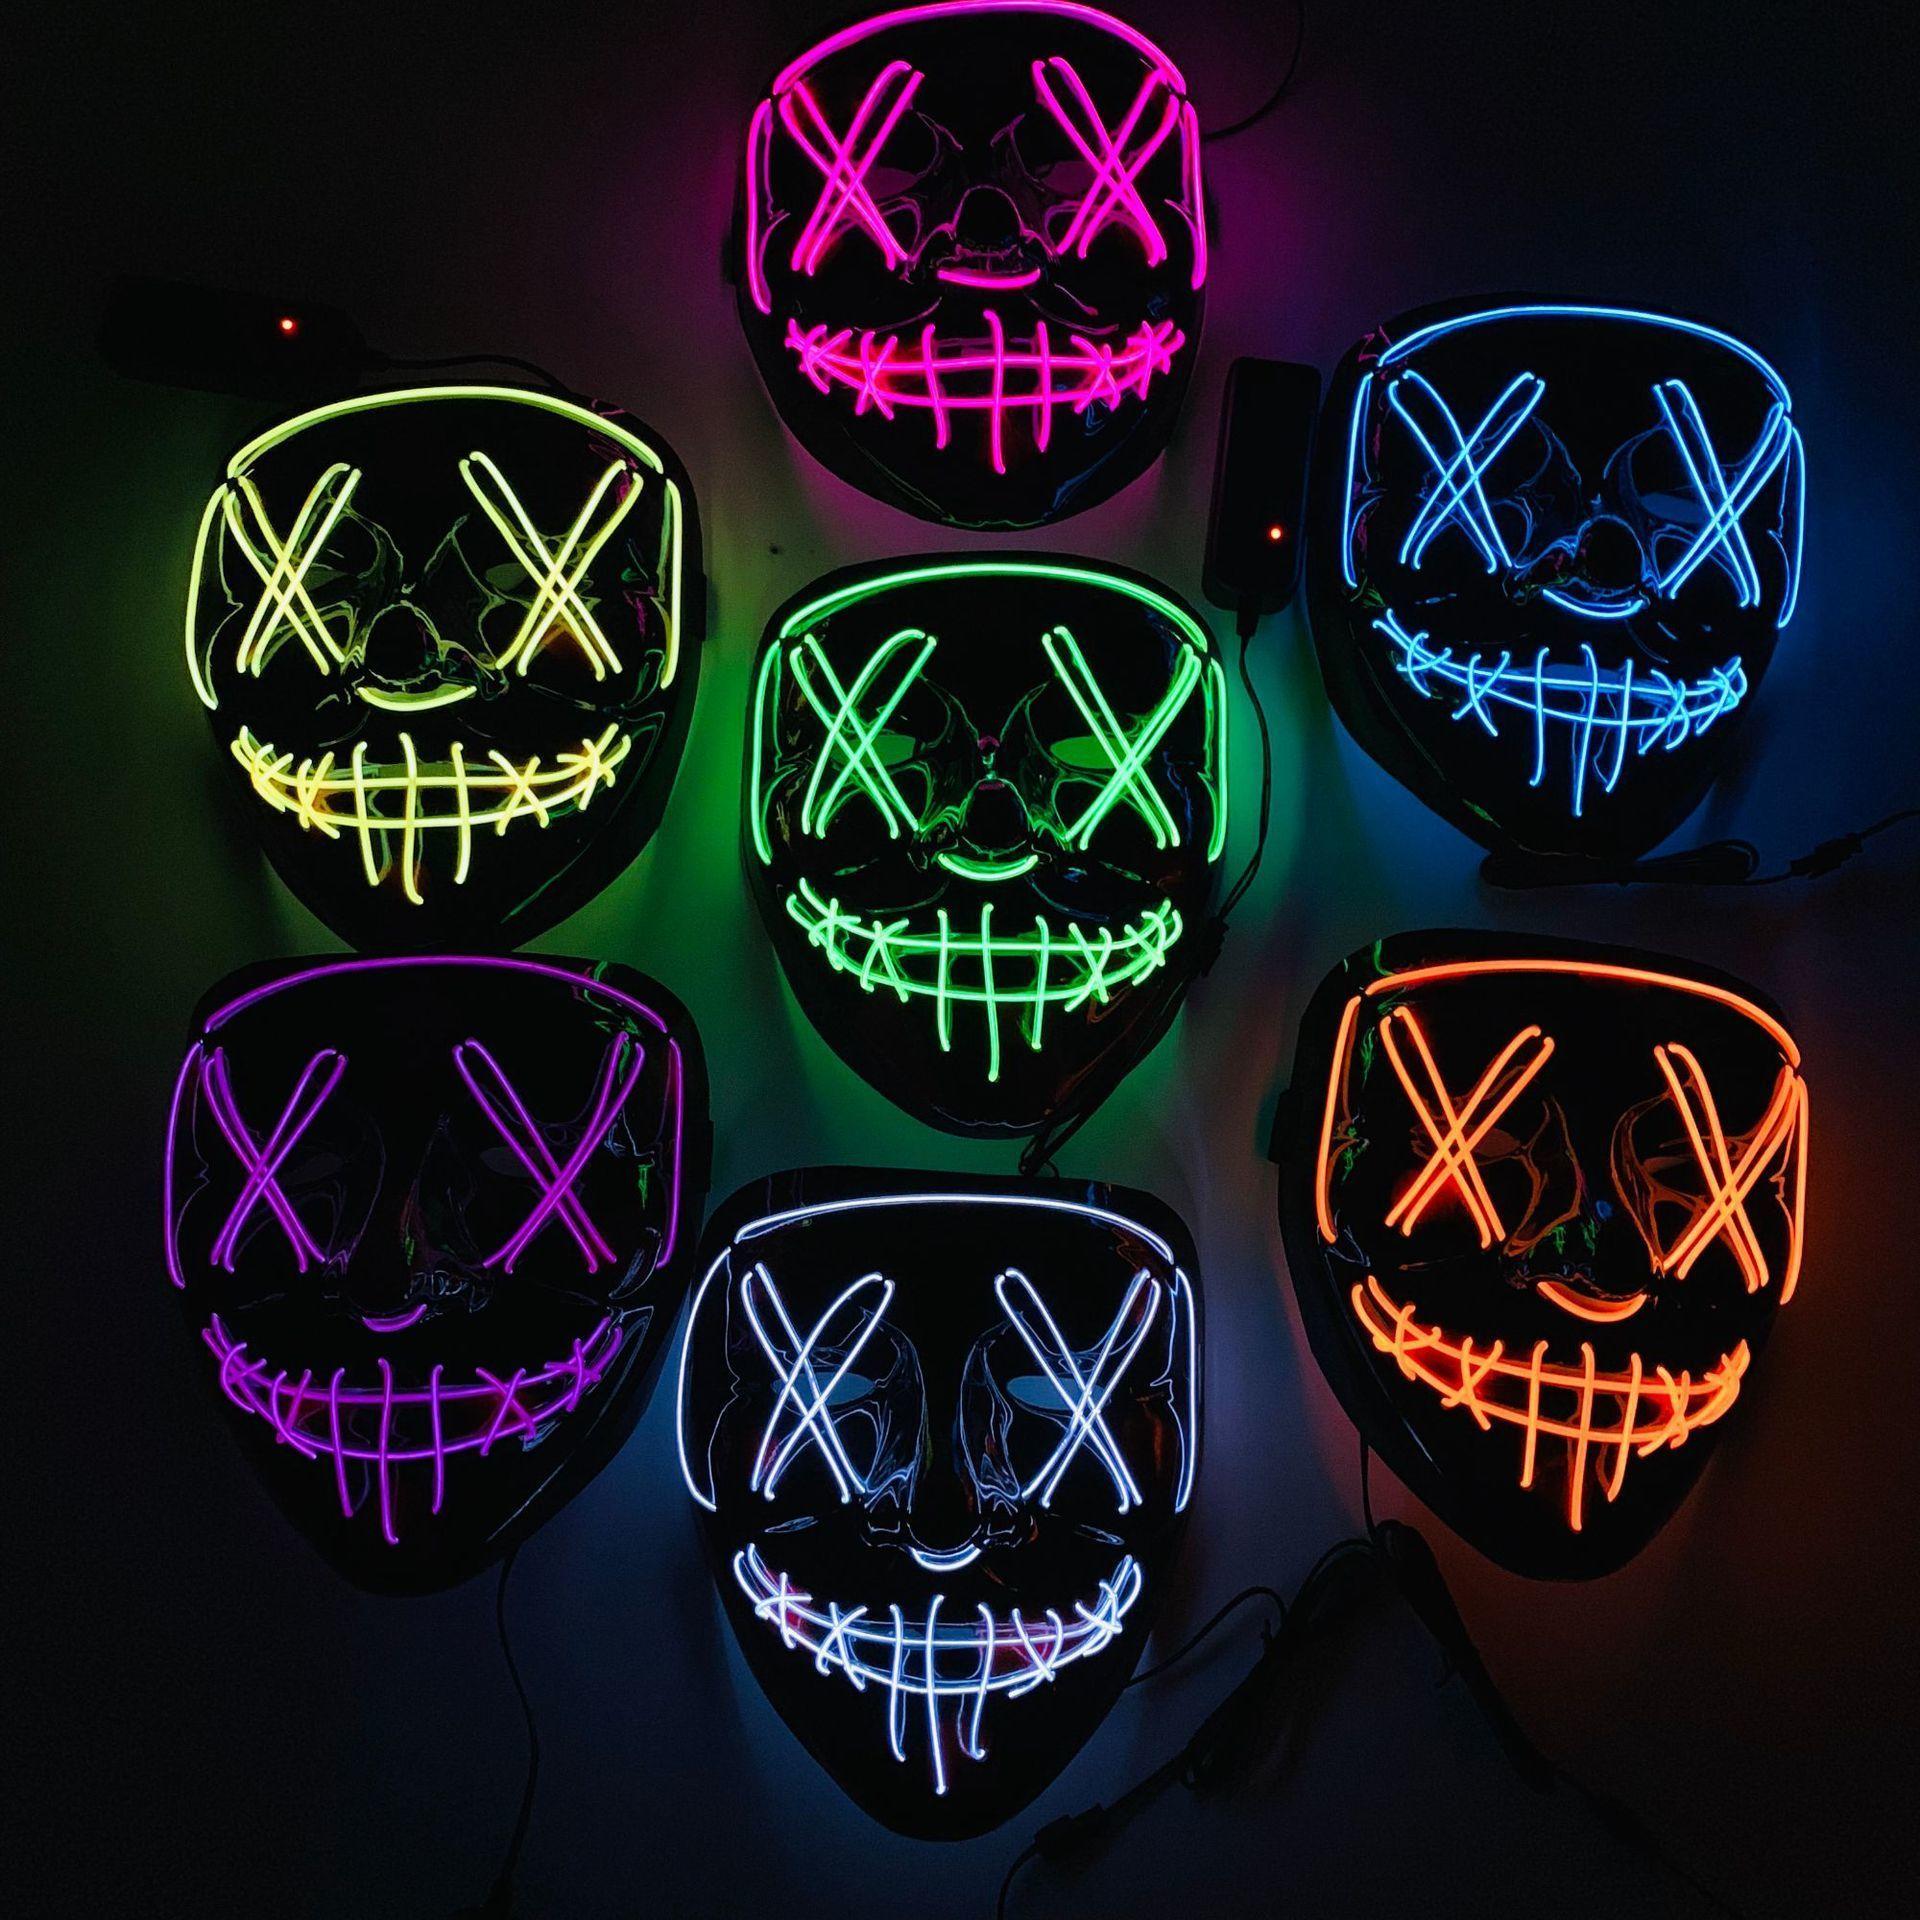 Halloween Mask LED Light Up Party Festivals Cosplay Masks Funny Mask Costume